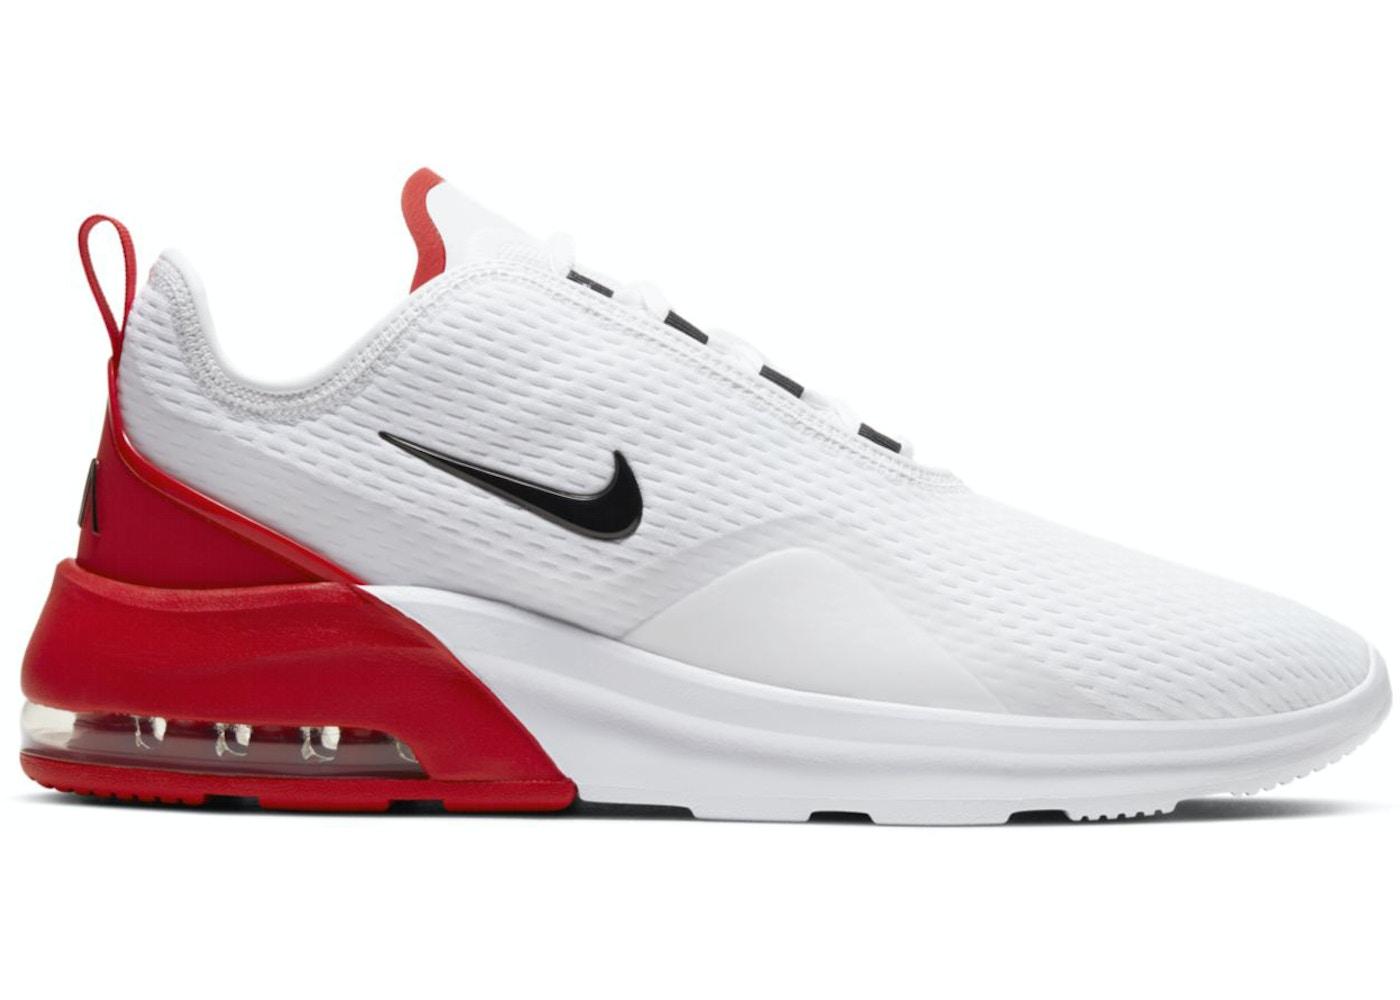 nieve Separar Mejor  Nike Air Max Motion 2 White University Red - AO0266-105